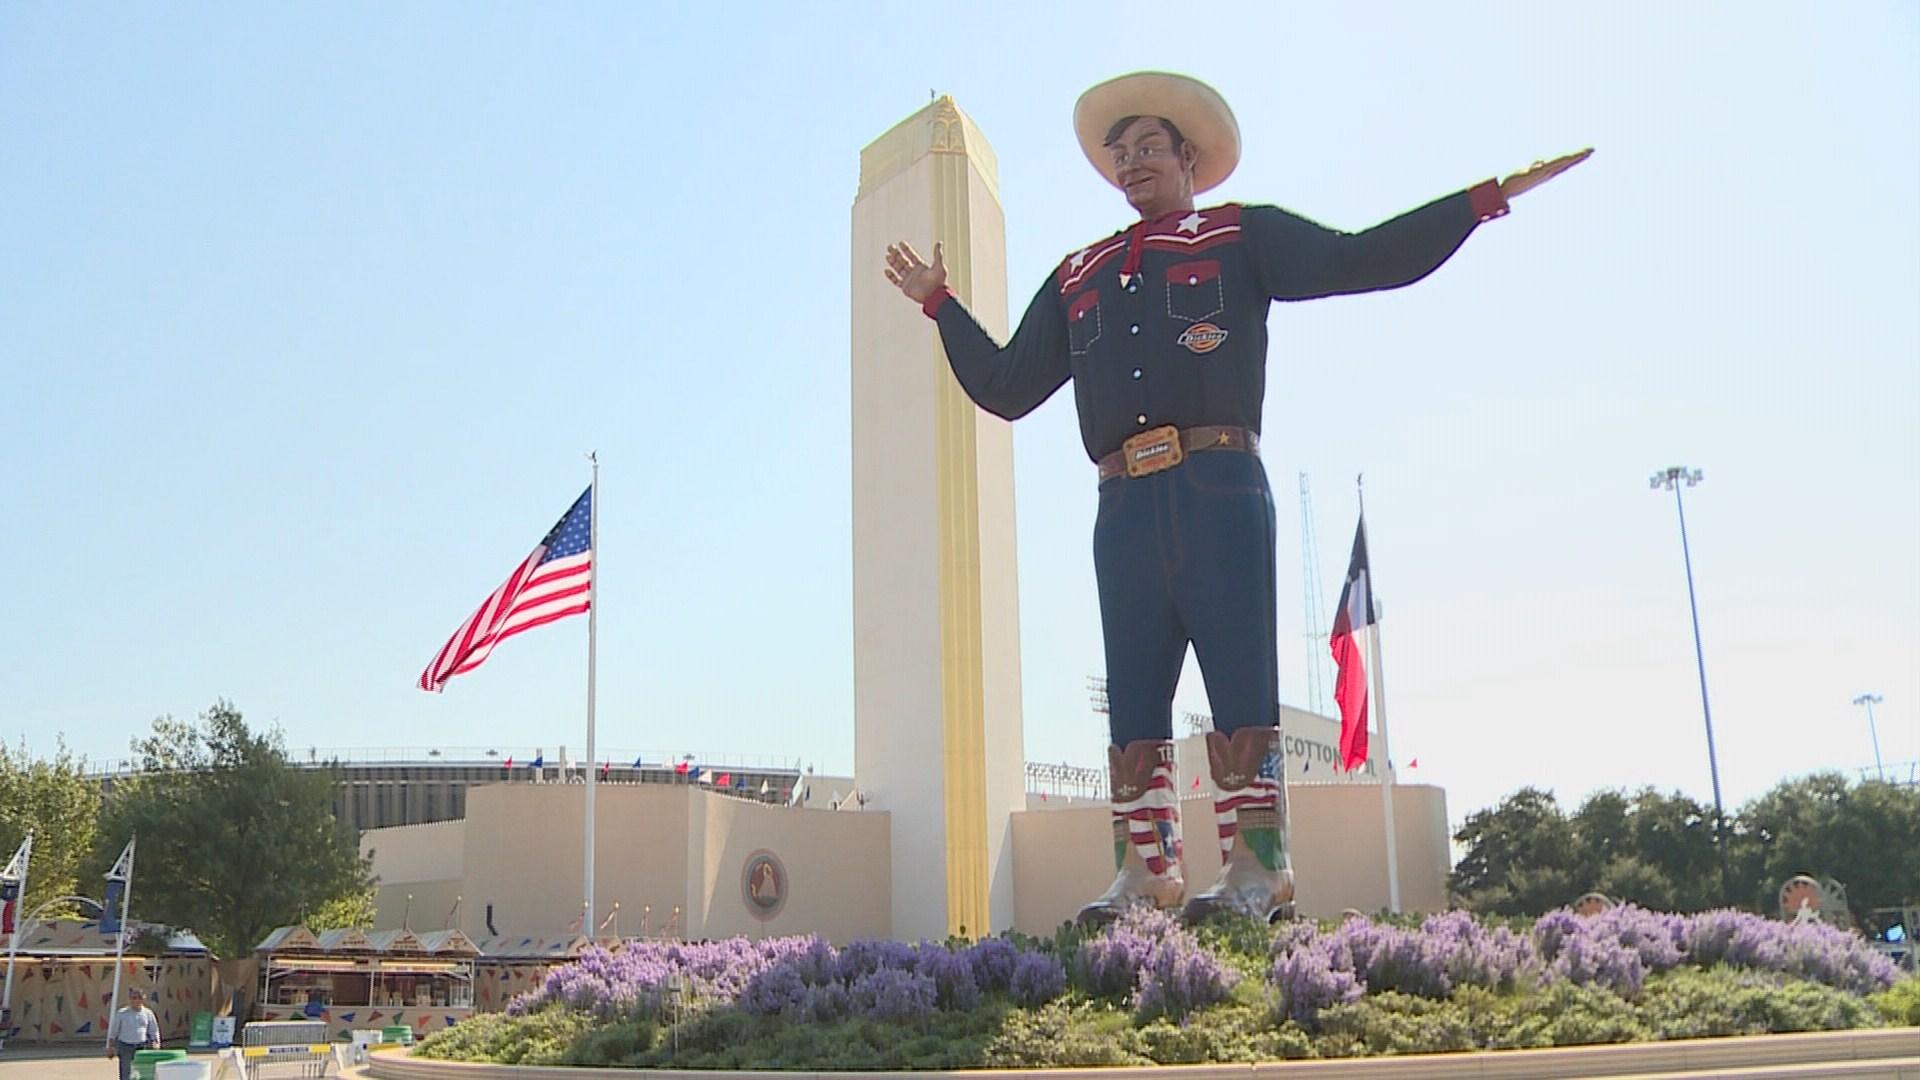 State Fair Of Texas Announces Semi Finalists In Annual Watermelon Wallpaper Rainbow Find Free HD for Desktop [freshlhys.tk]